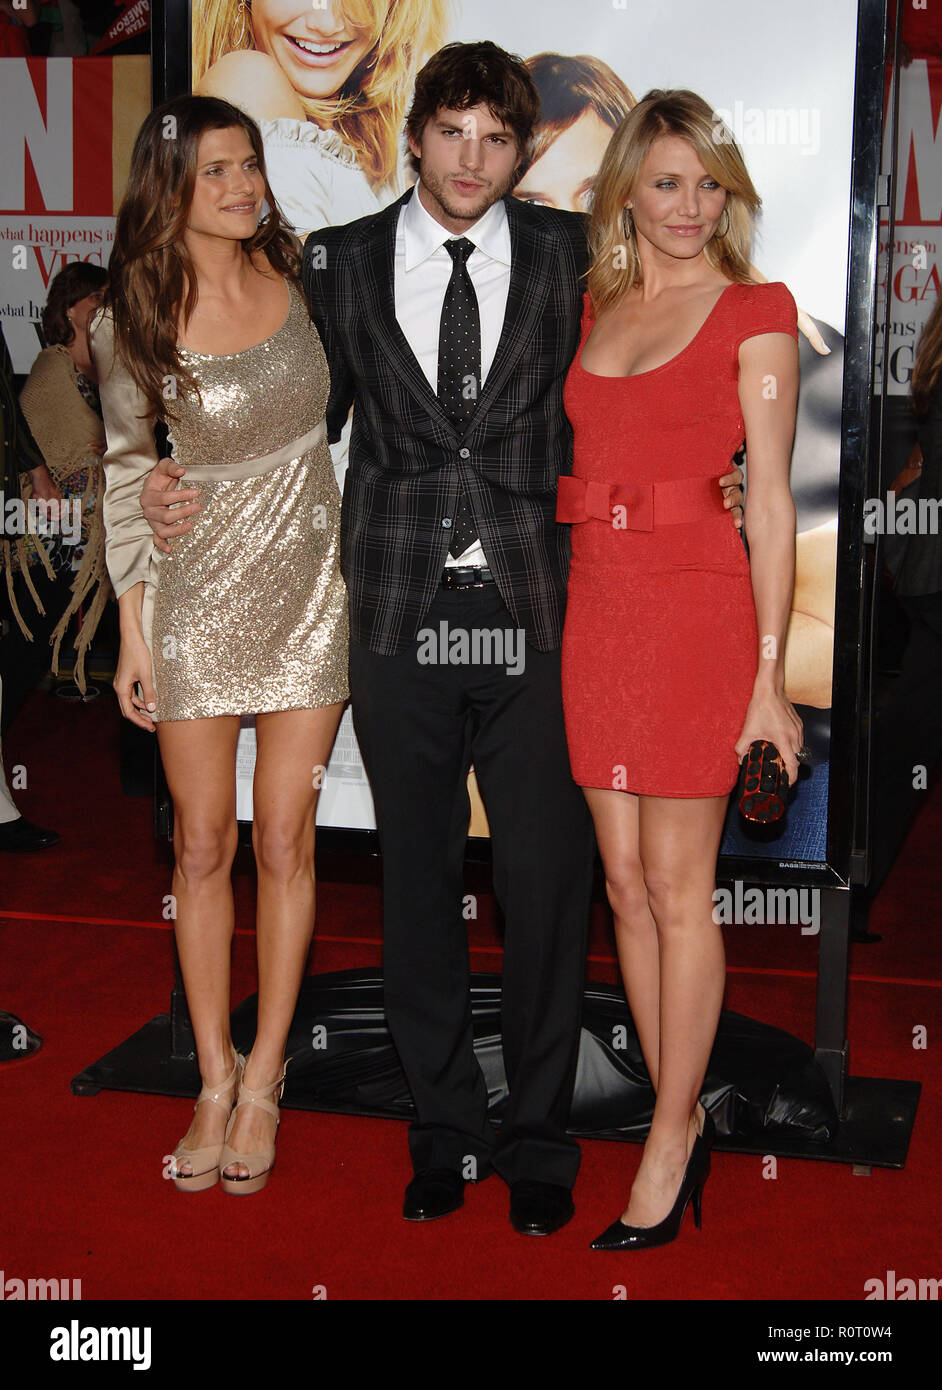 Ashton Kutcher Cameron Diaz And Lake Bell What Happens In Vegas